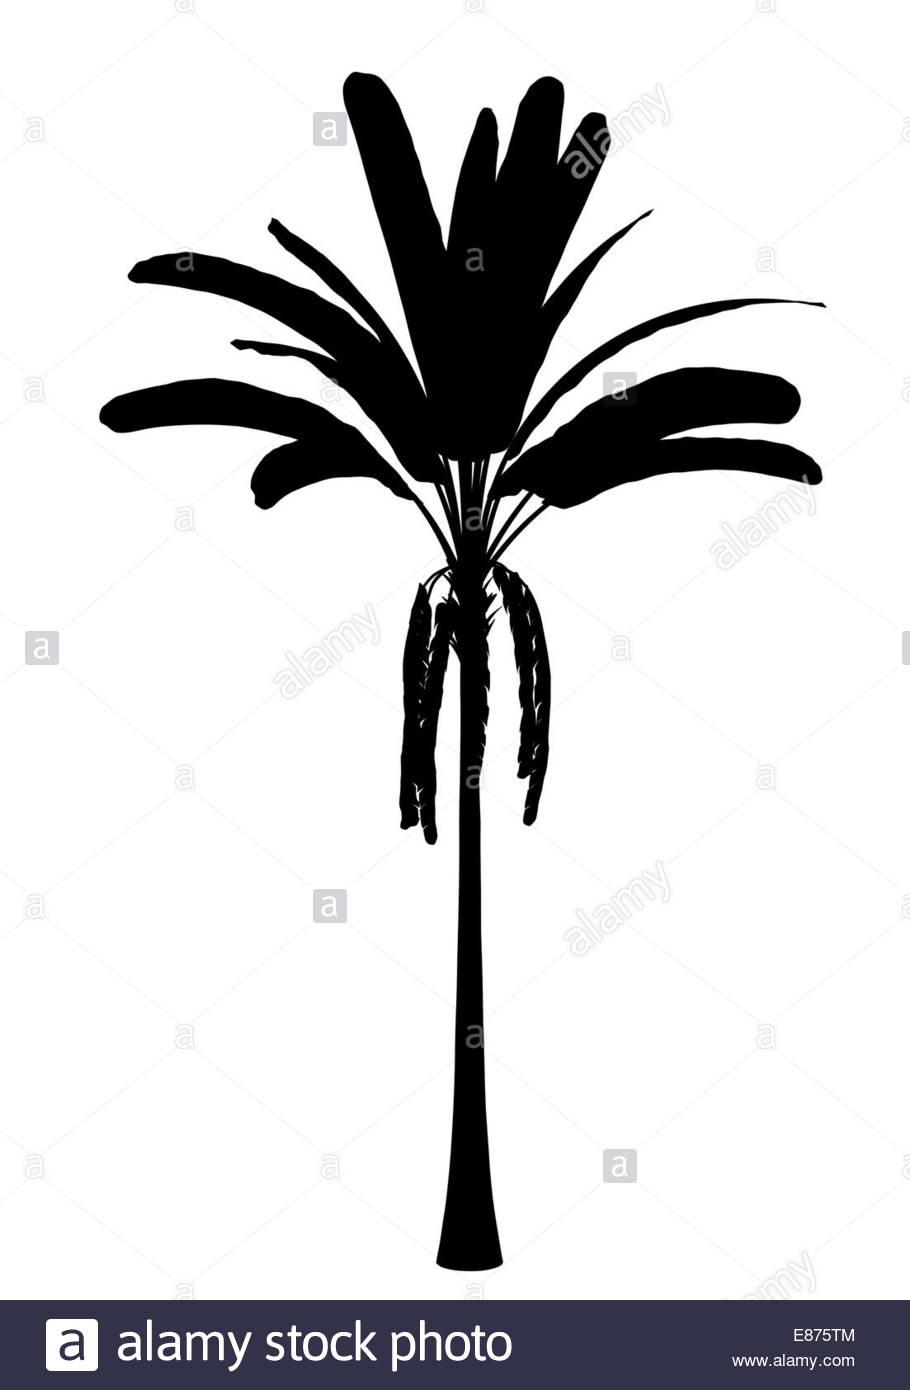 910x1390 Banana Tree Black And White Stock Photos Amp Images